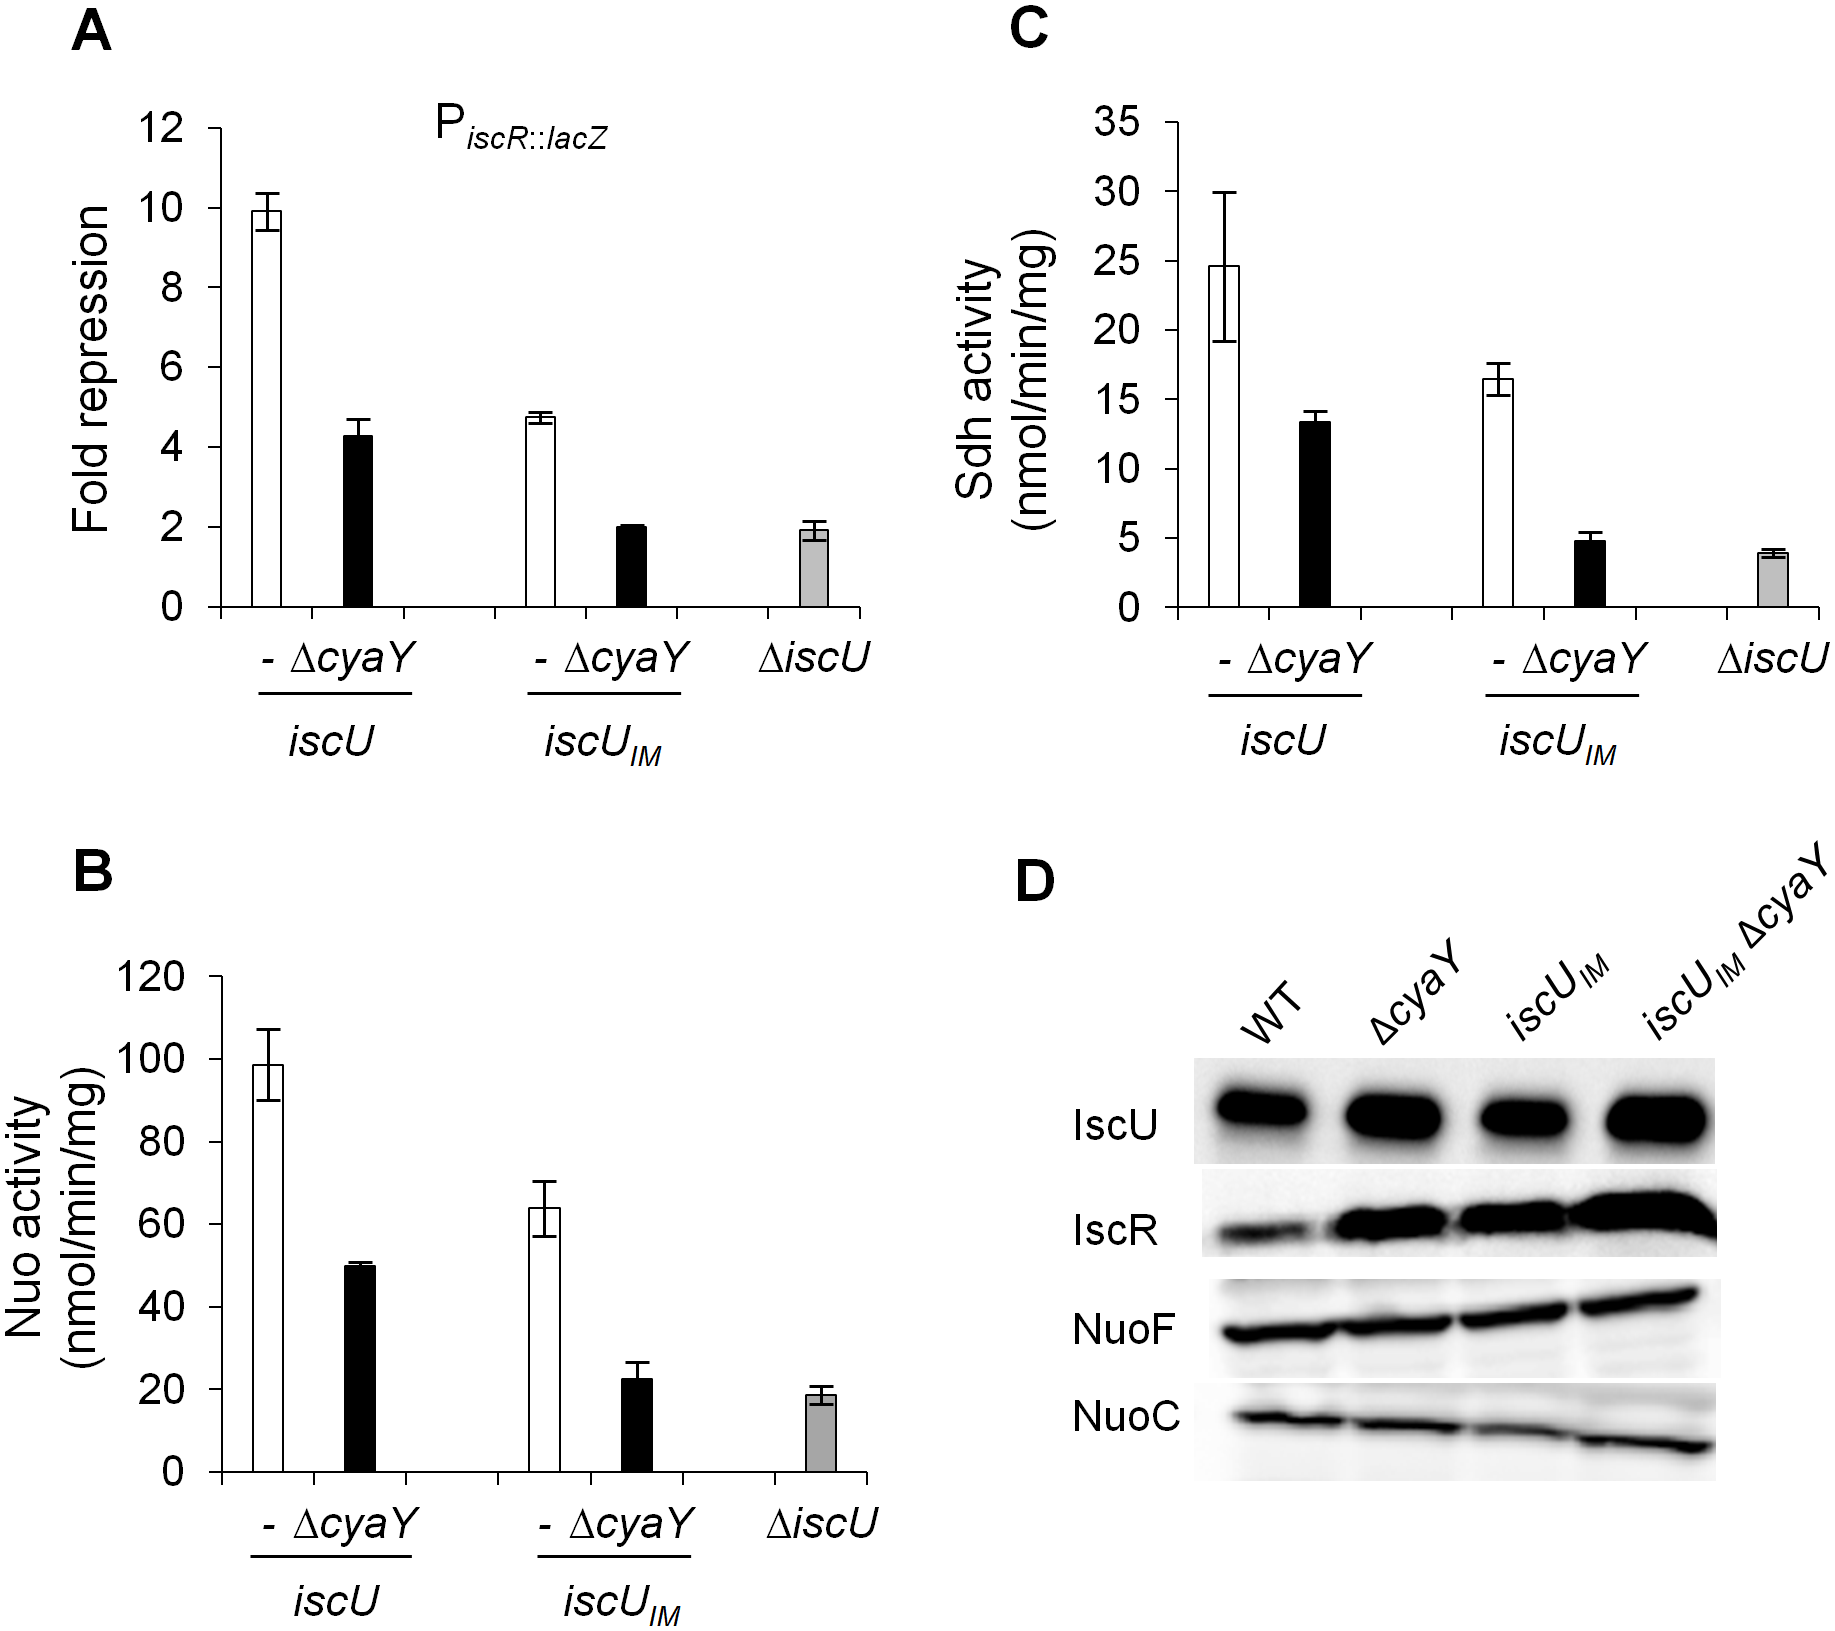 Activities of Fe-S proteins in <i>iscU</i><sub><i>IM</i></sub> and Δ<i>cyaY</i> strains.